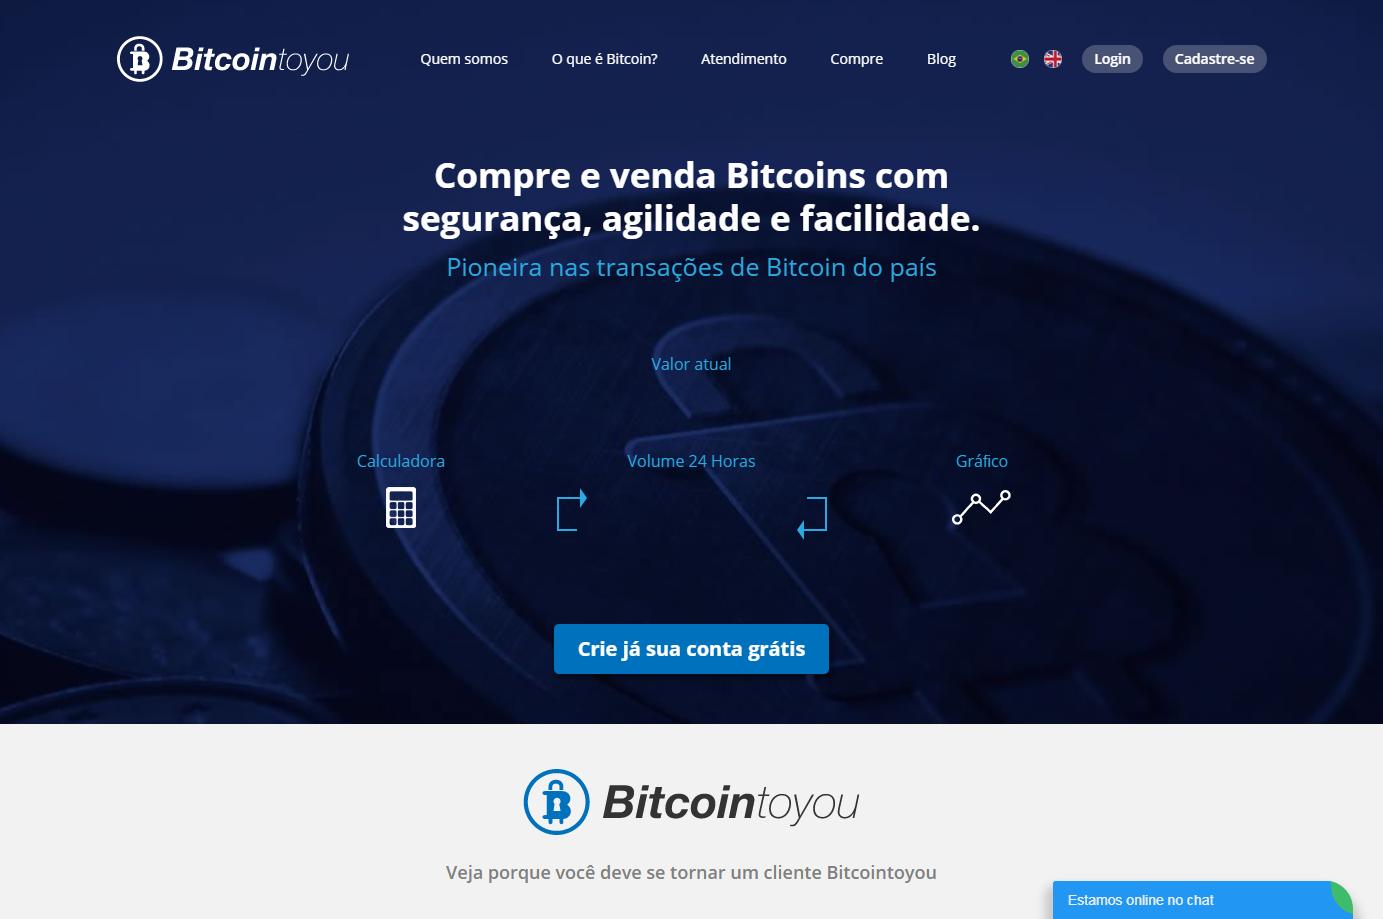 Bitcointoyou main page | BitcoinBestBuy